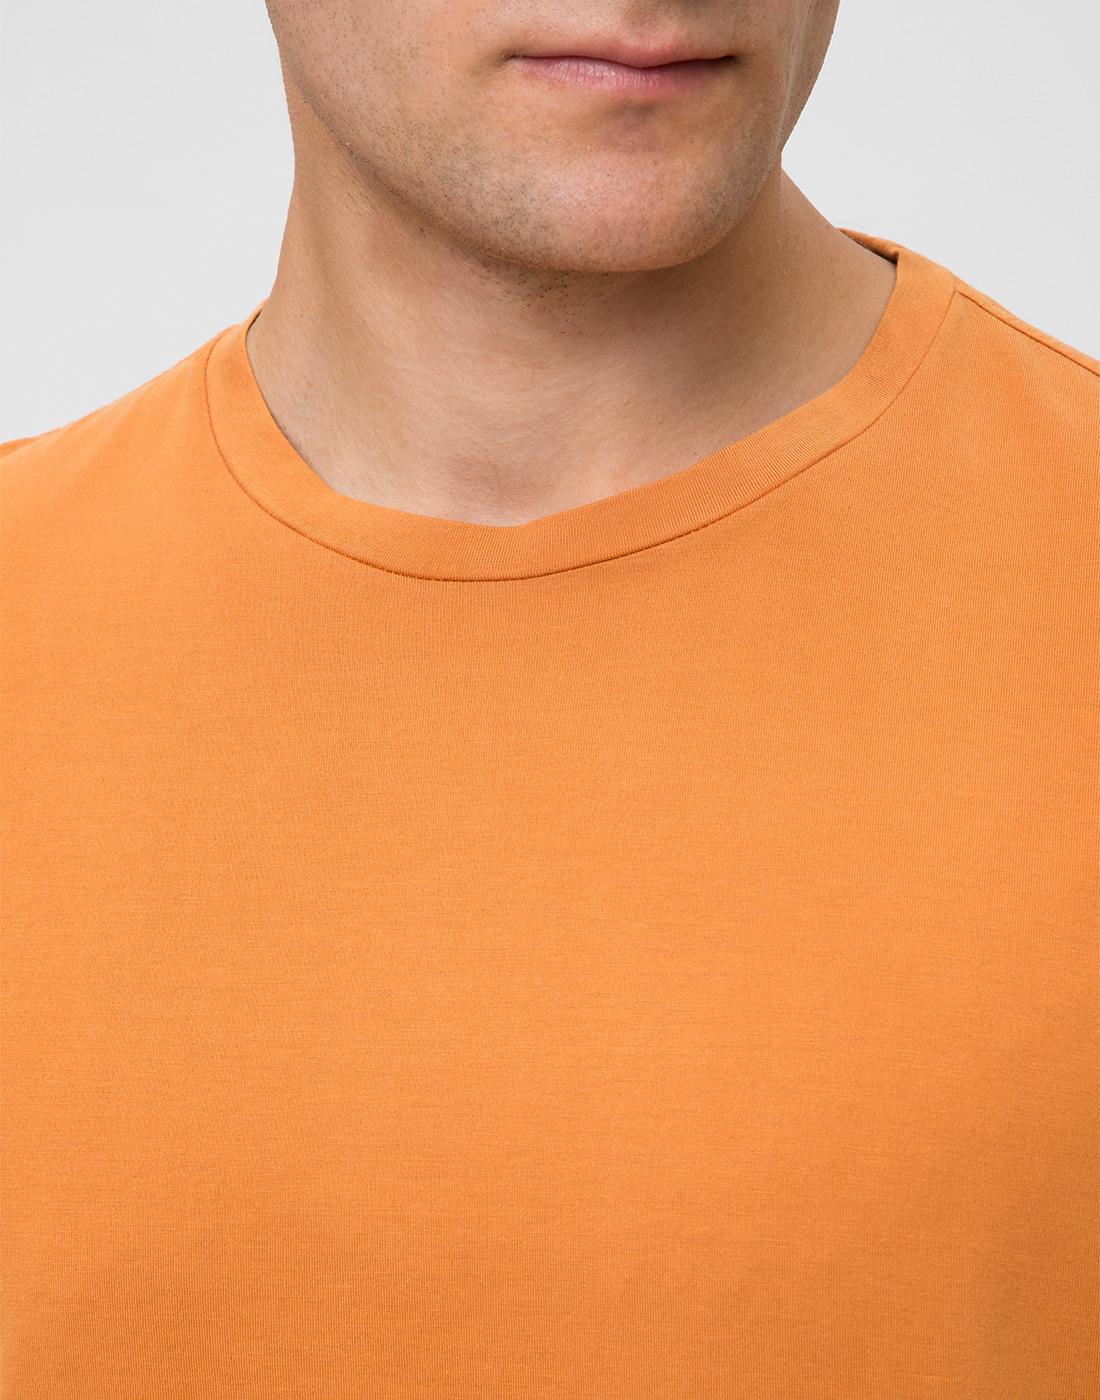 Мужская оранжевая футболка Capobianco S4M660.AL01 ARANCIONE-6